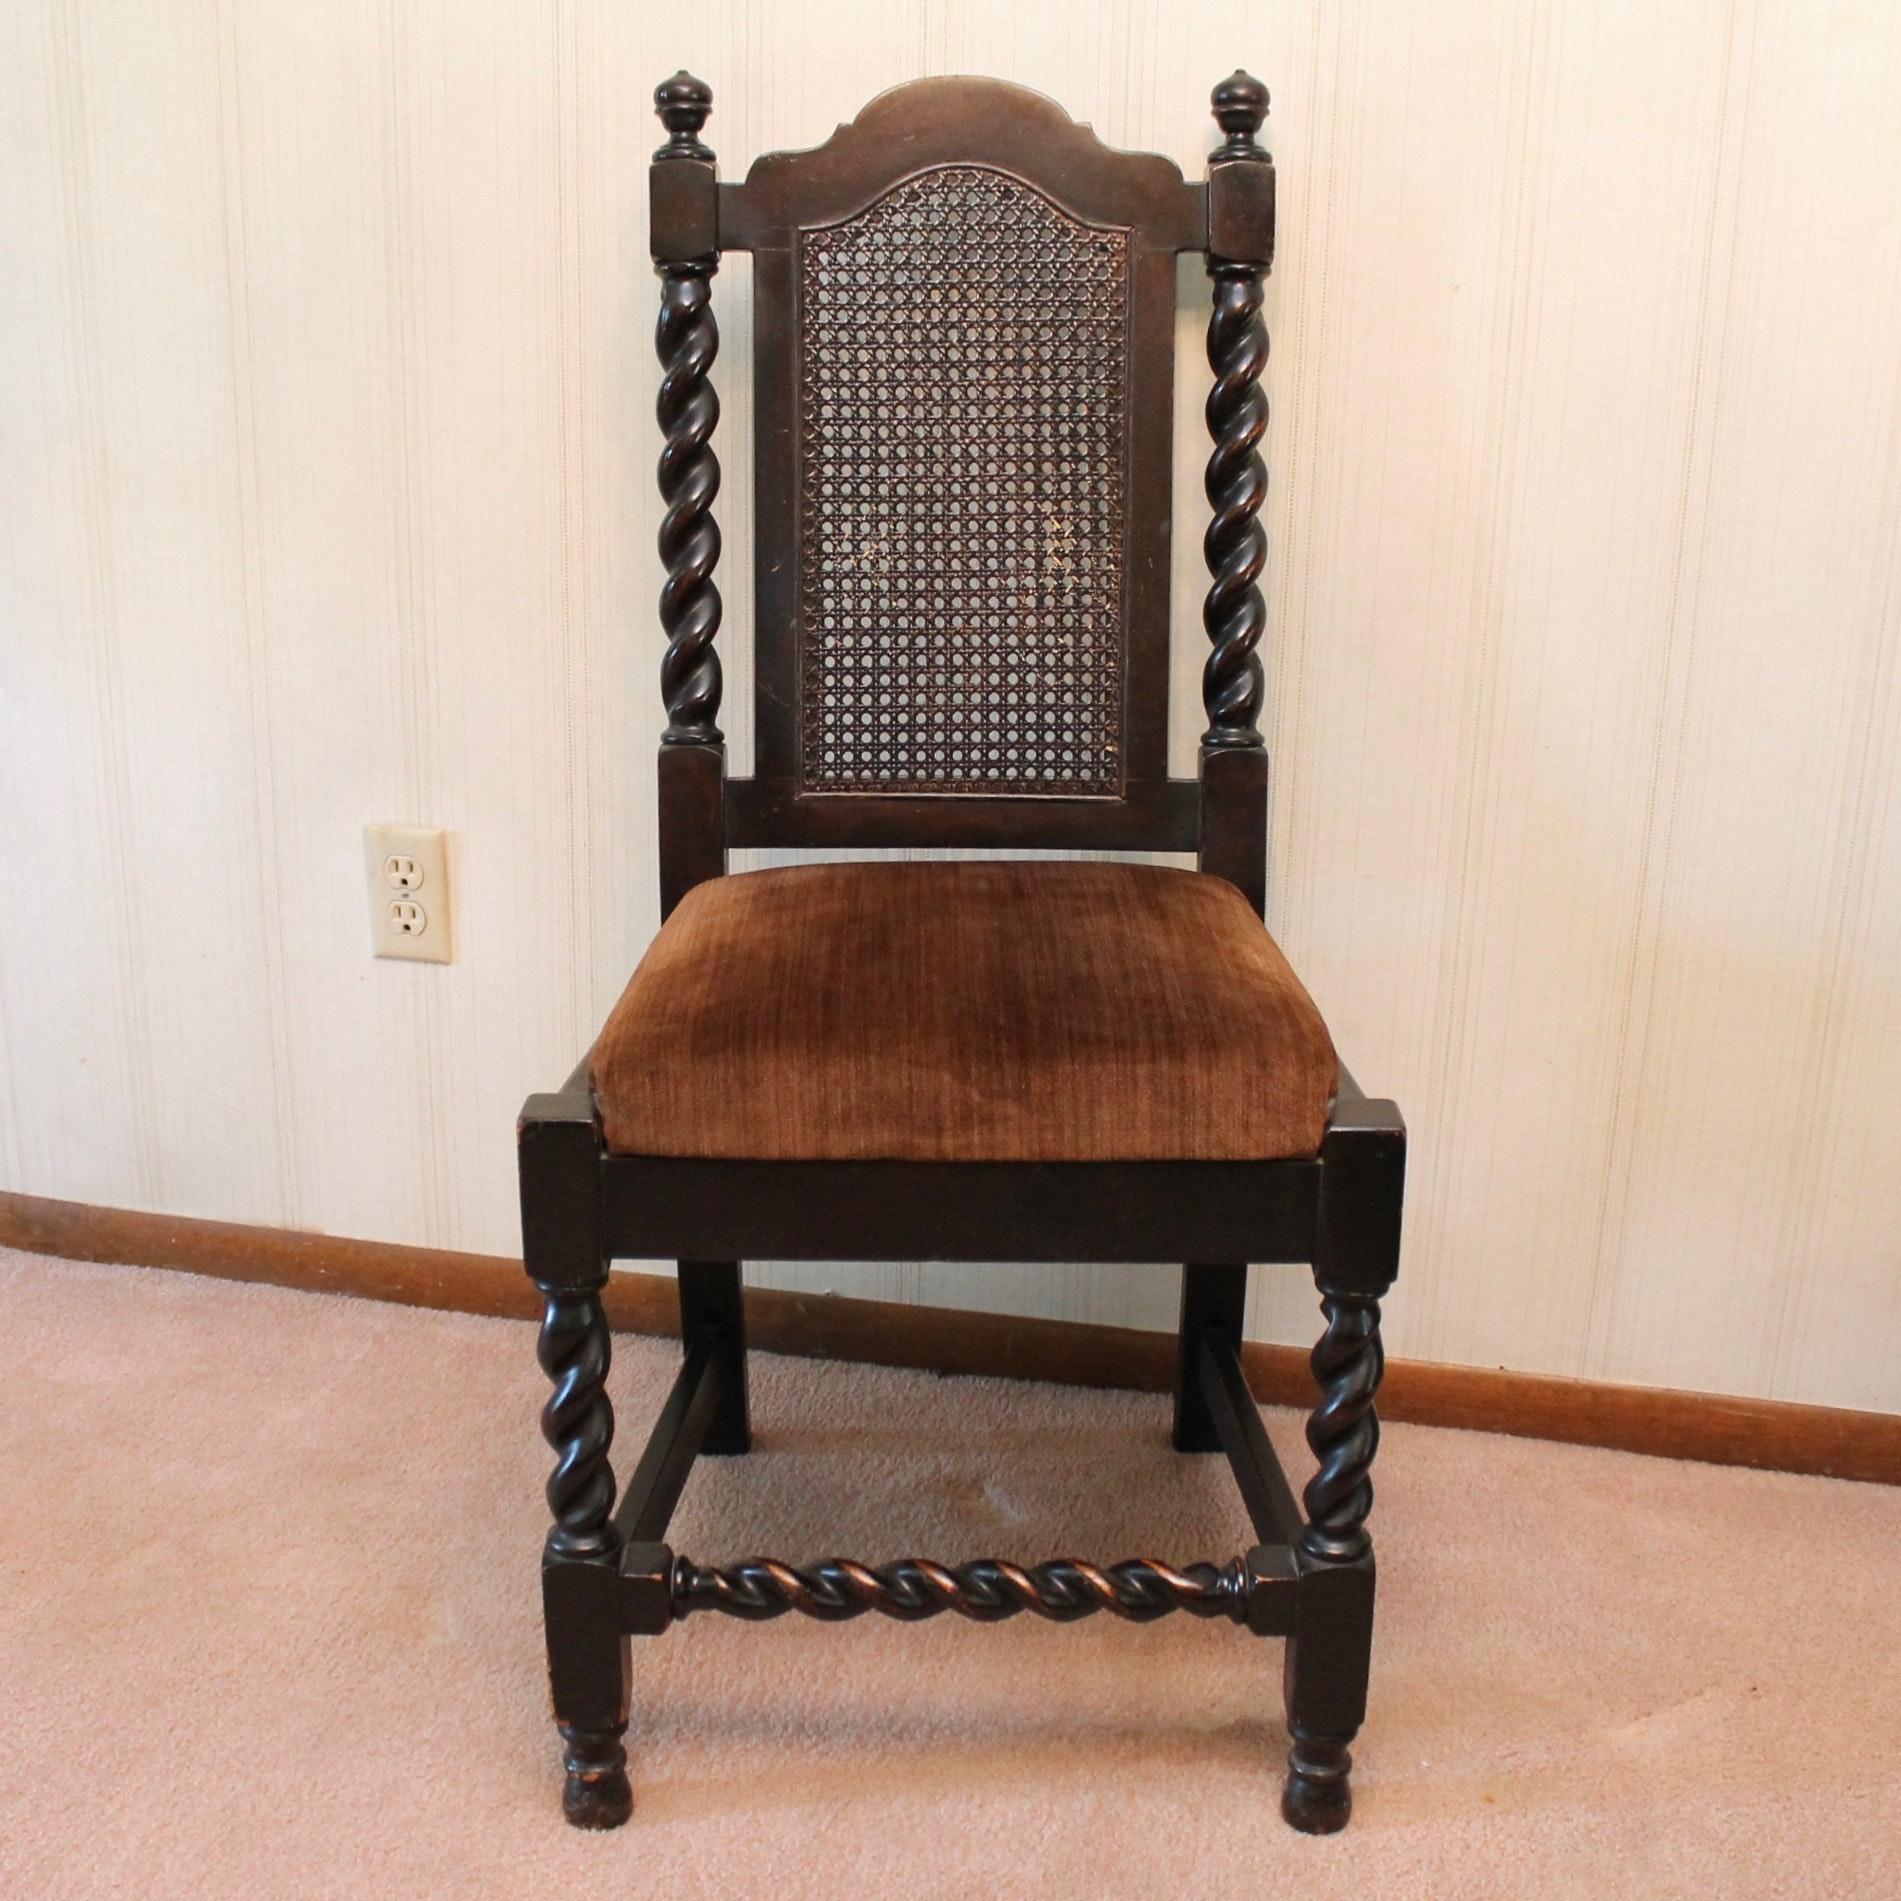 Antique Cane Back Barley Twist Chair